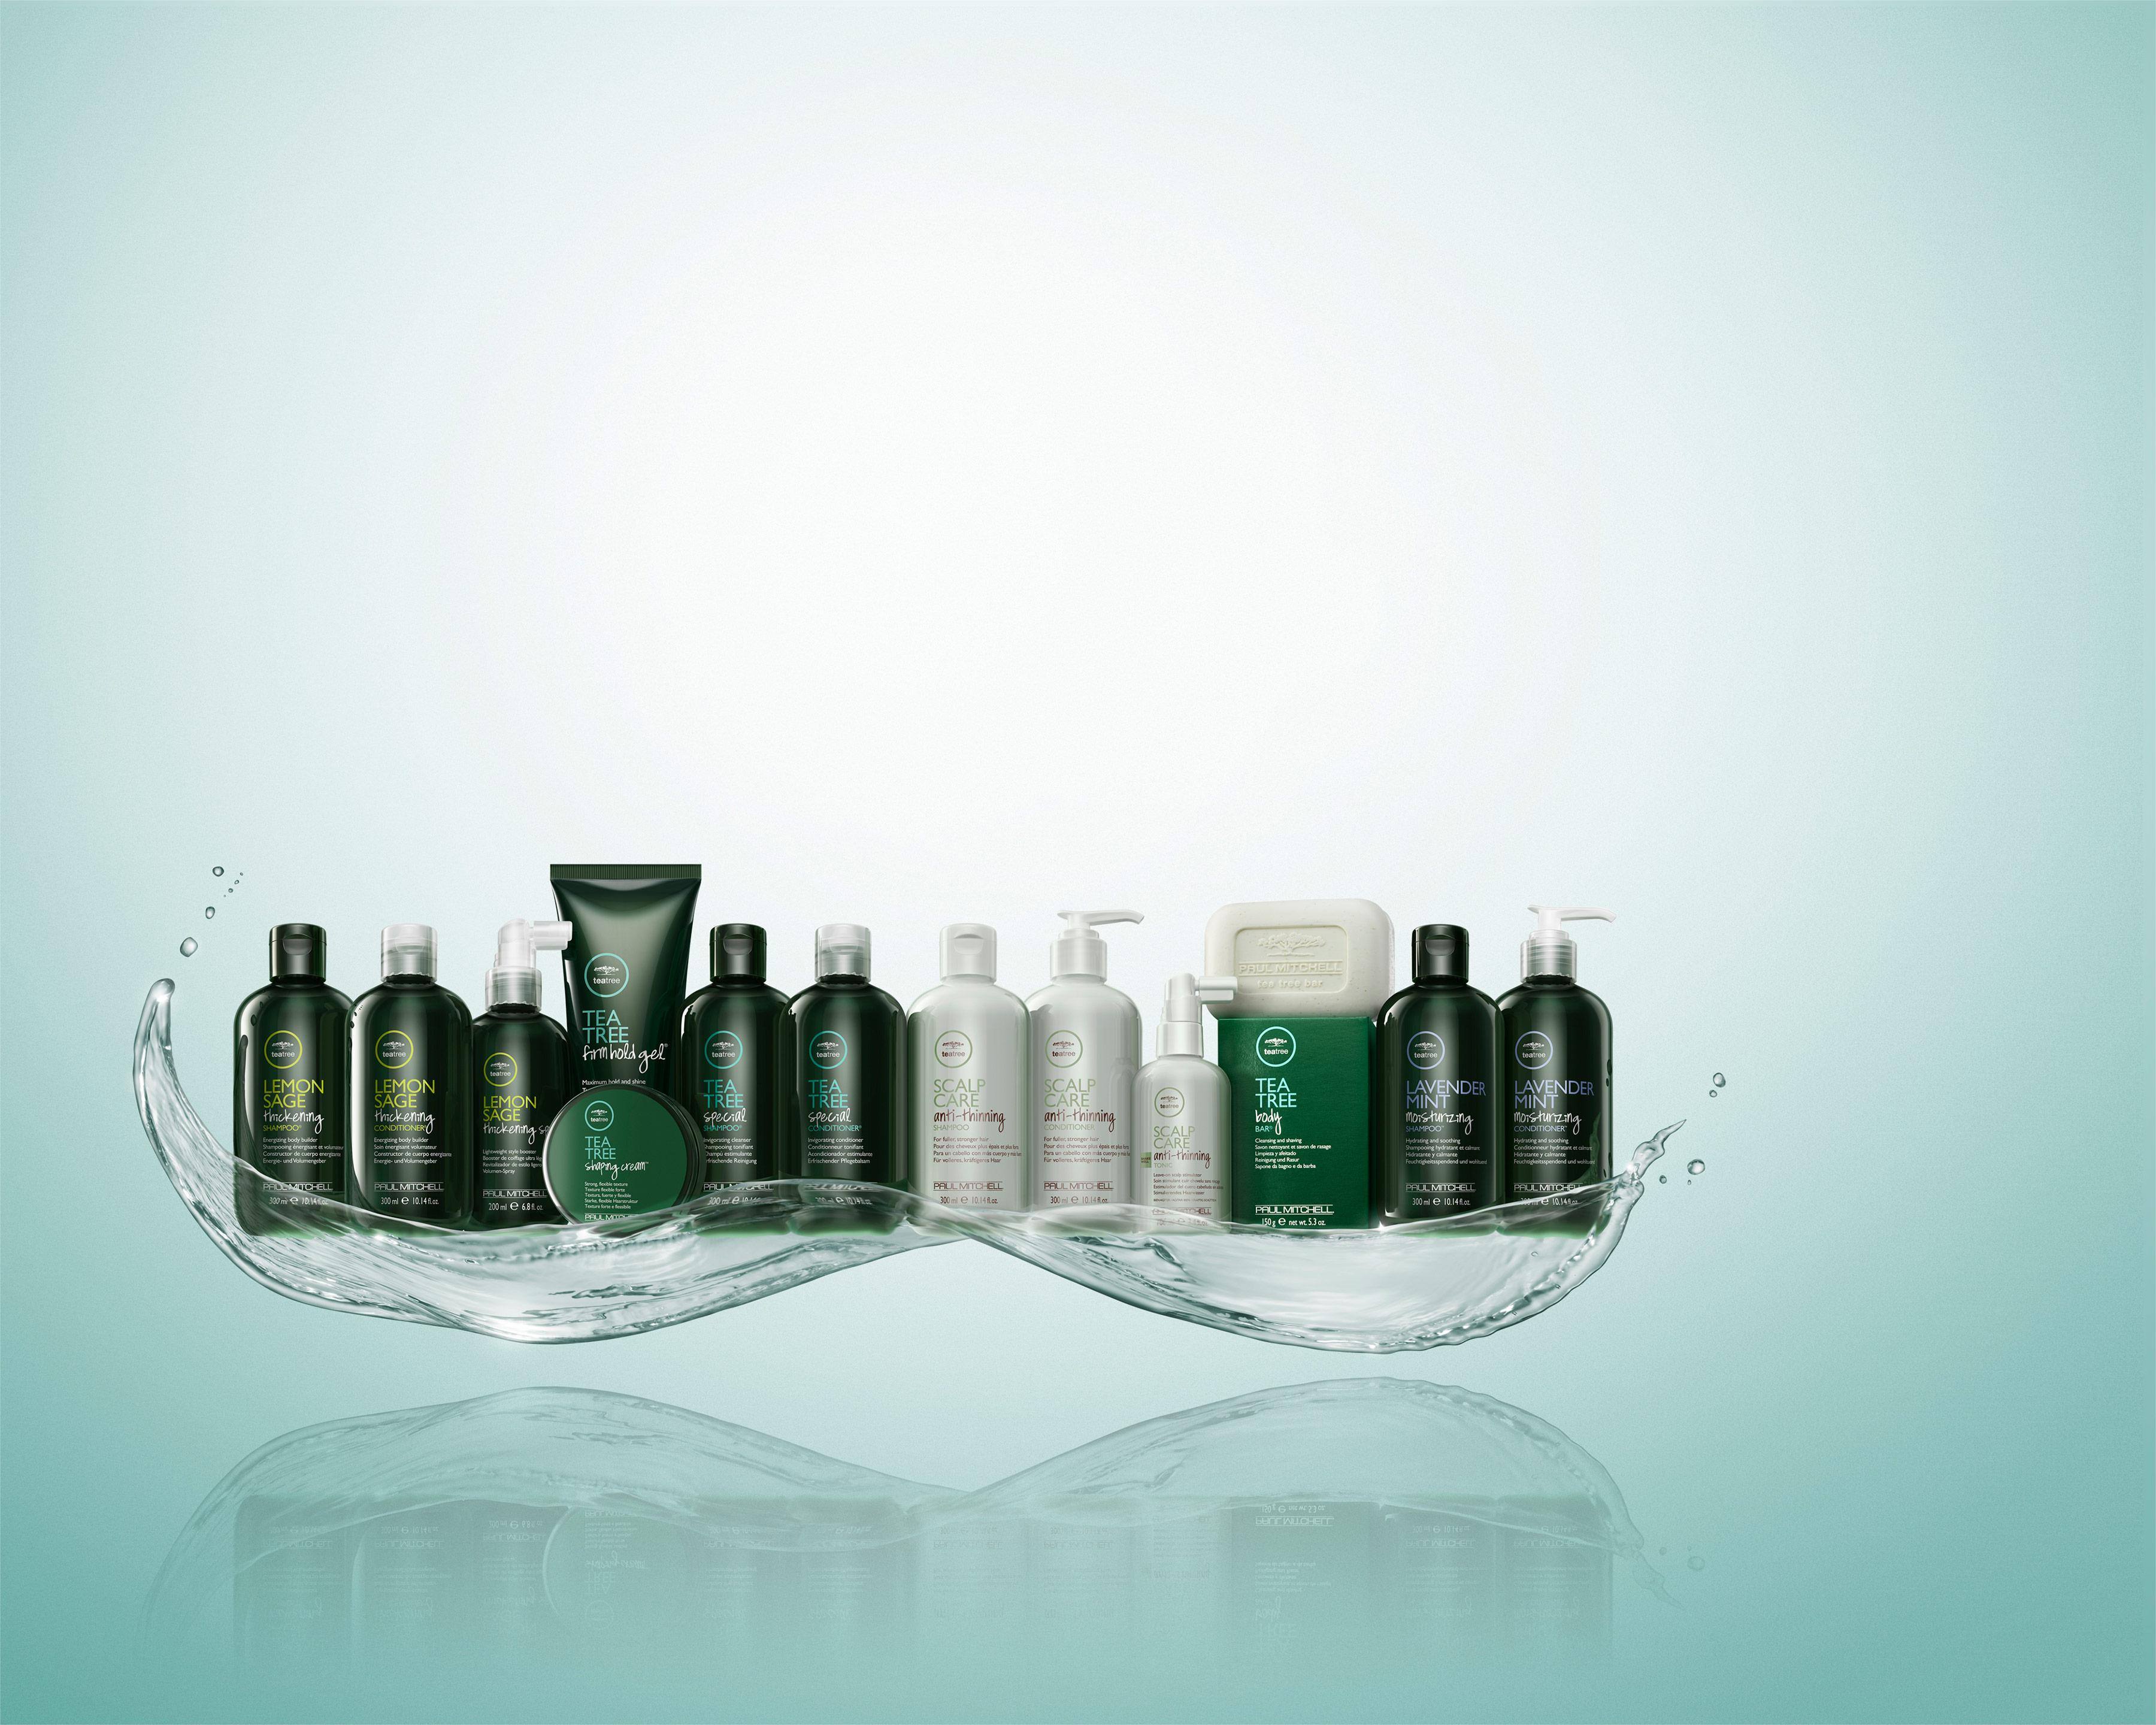 Illusions Salon Tea Tree products